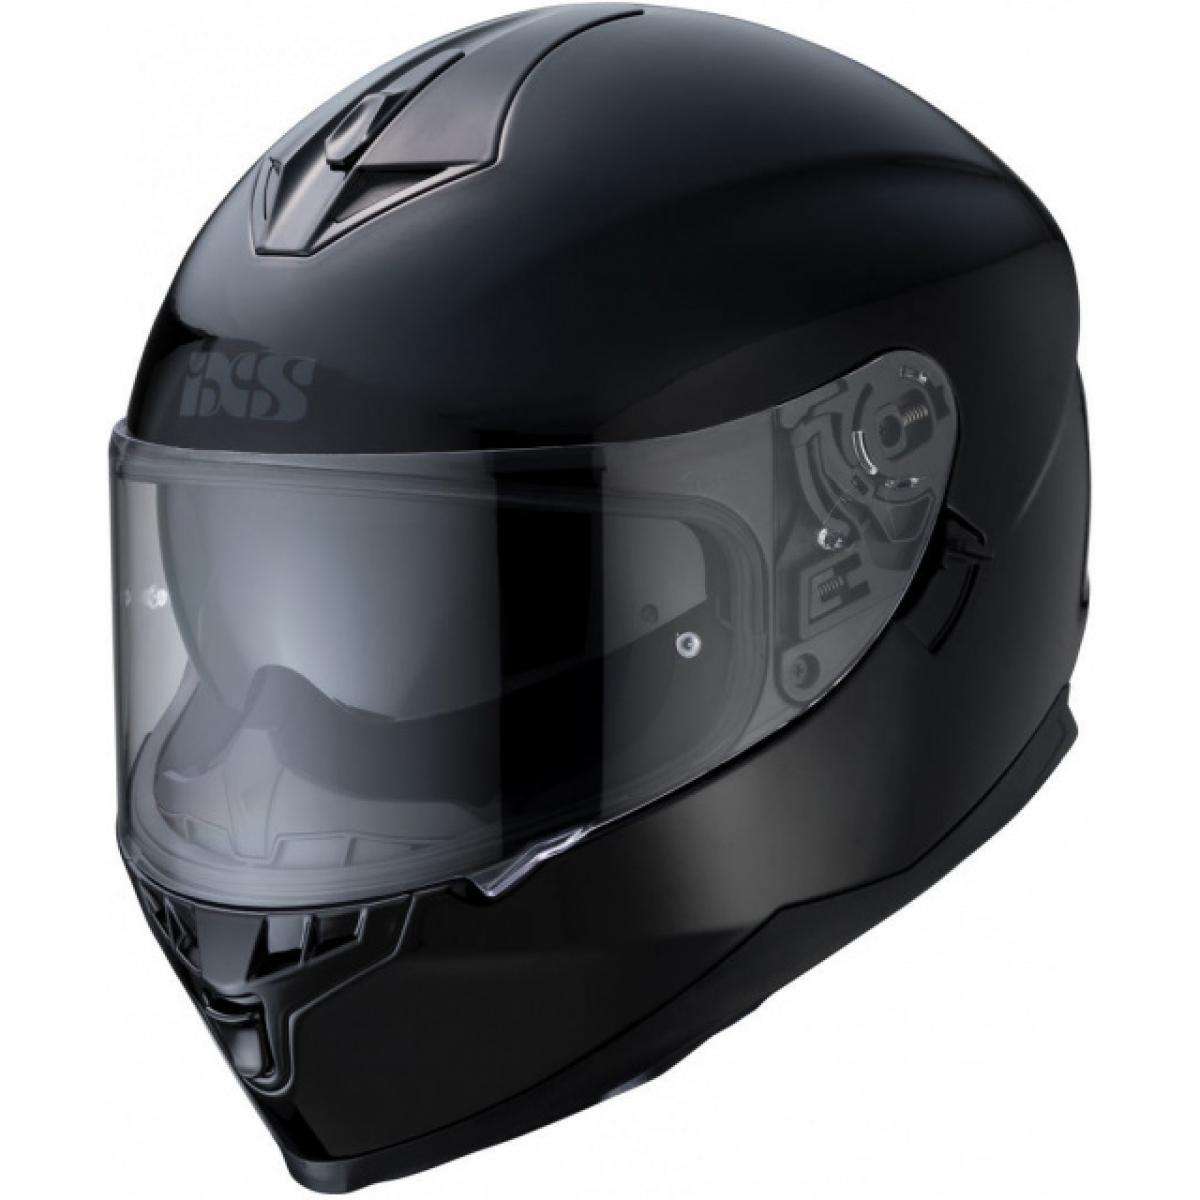 Мотошлем IXS HX 1100 Black , L